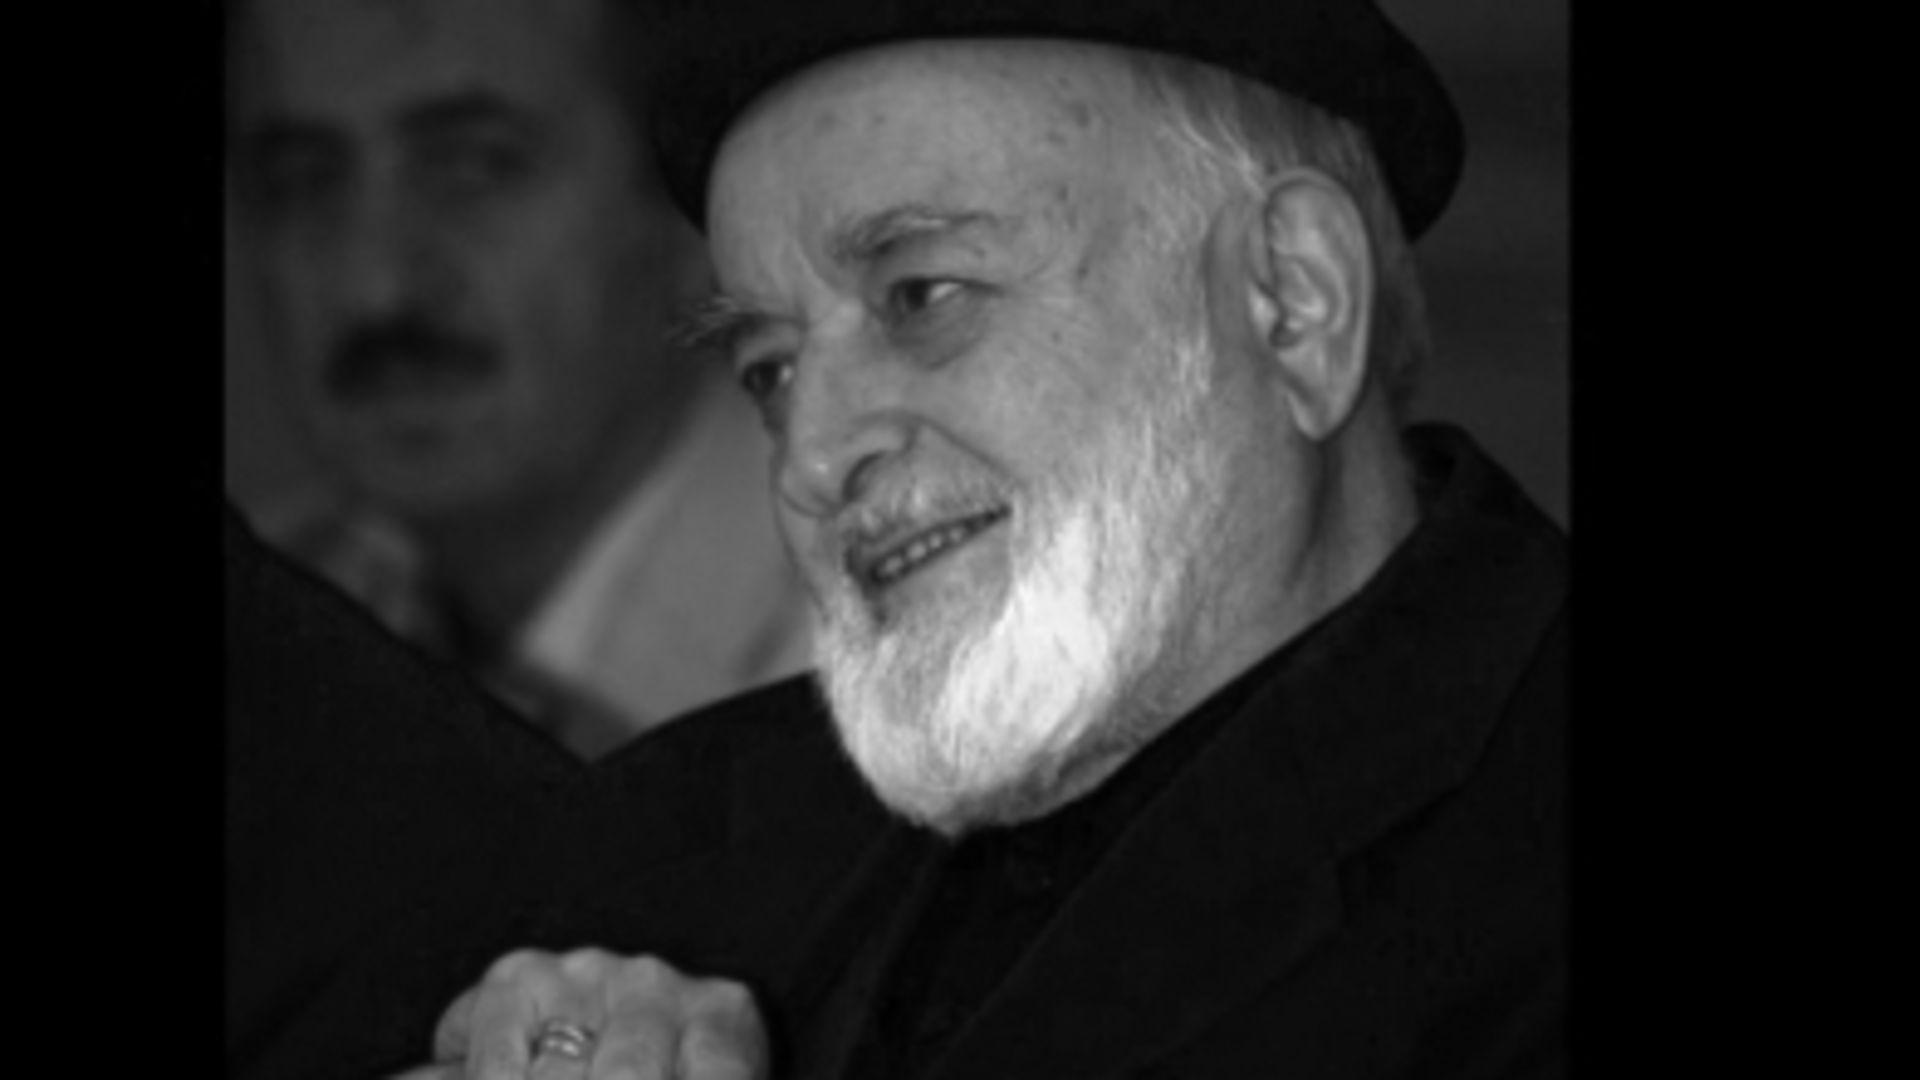 Son dakika taziye: Muhammed Emin Saraç vefat etti!